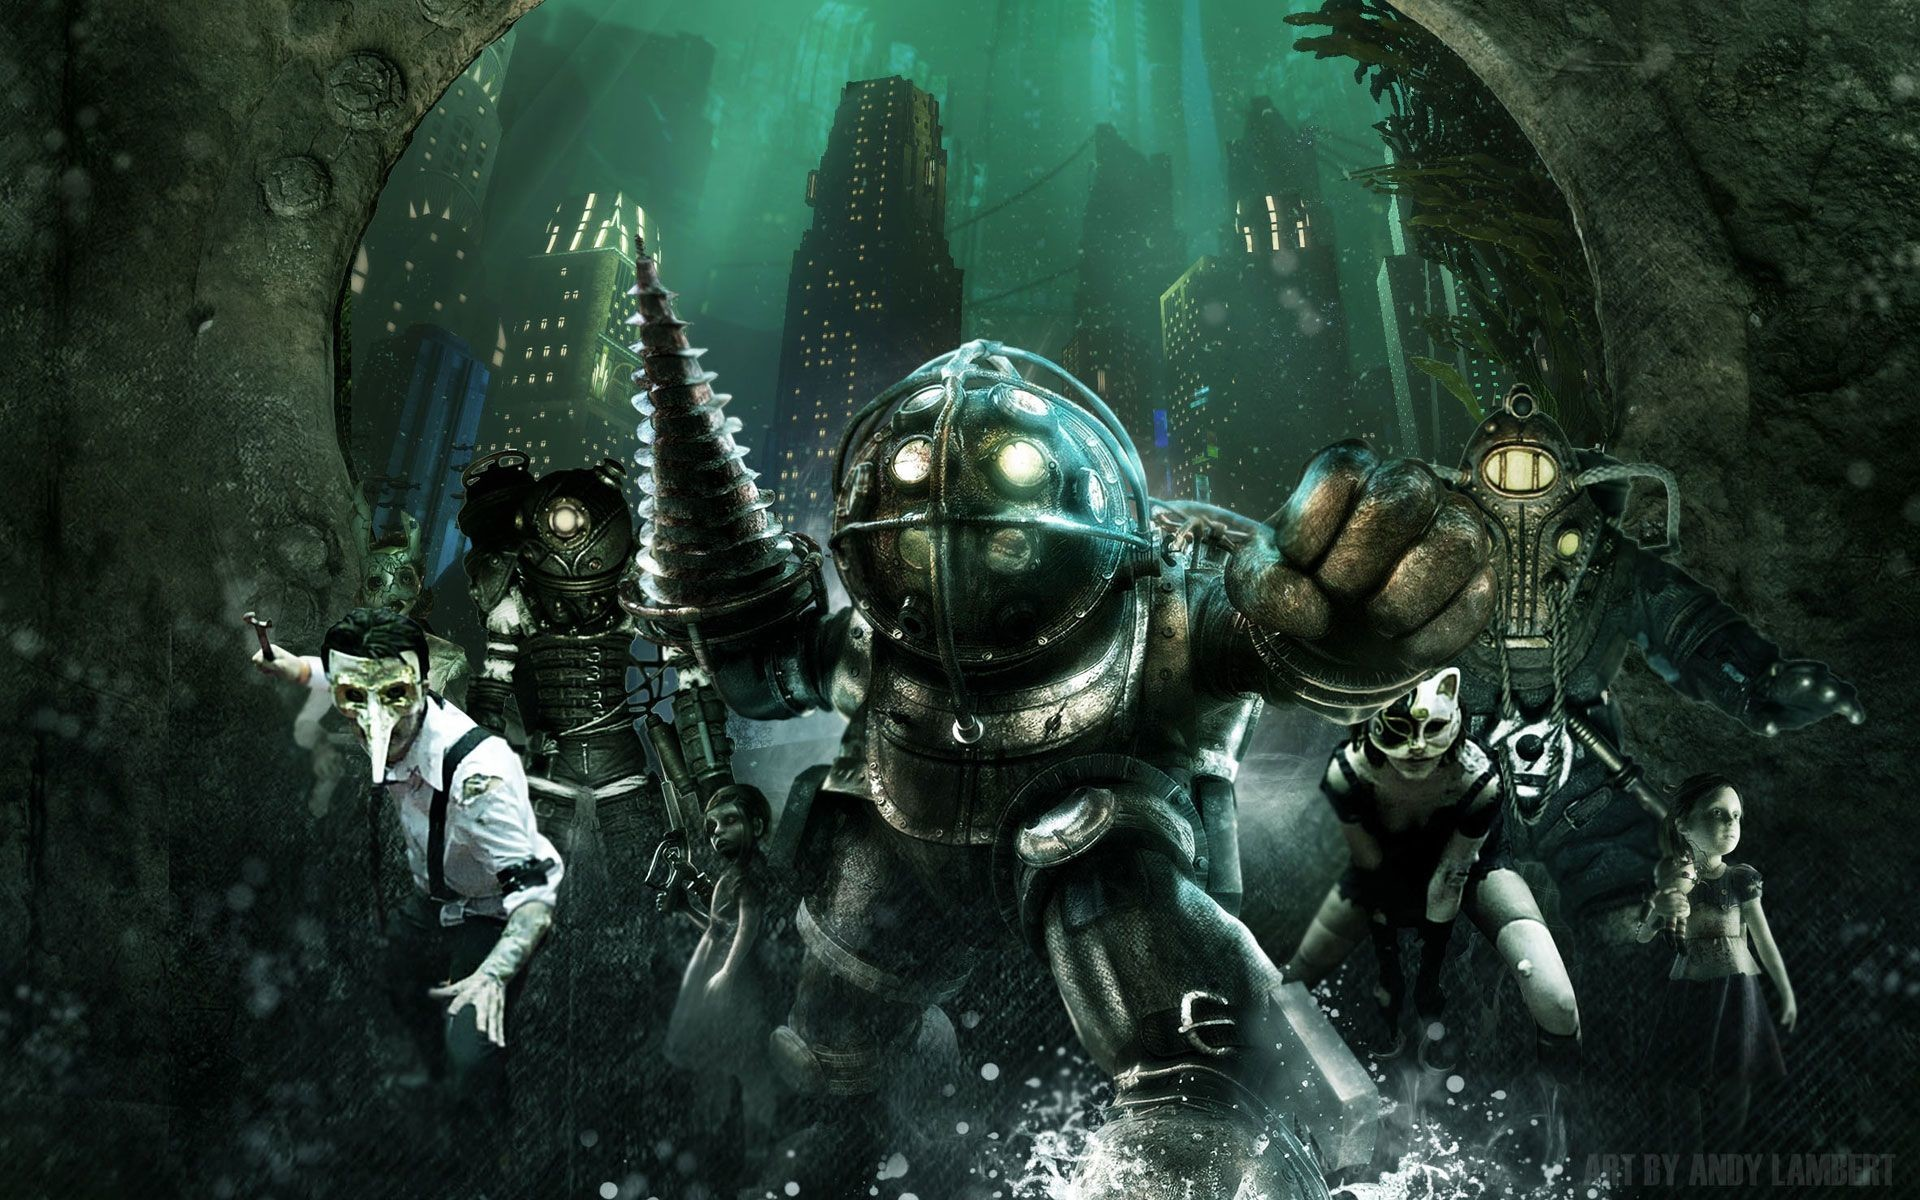 Bioshock Big Daddy Wallpaper 69 Images